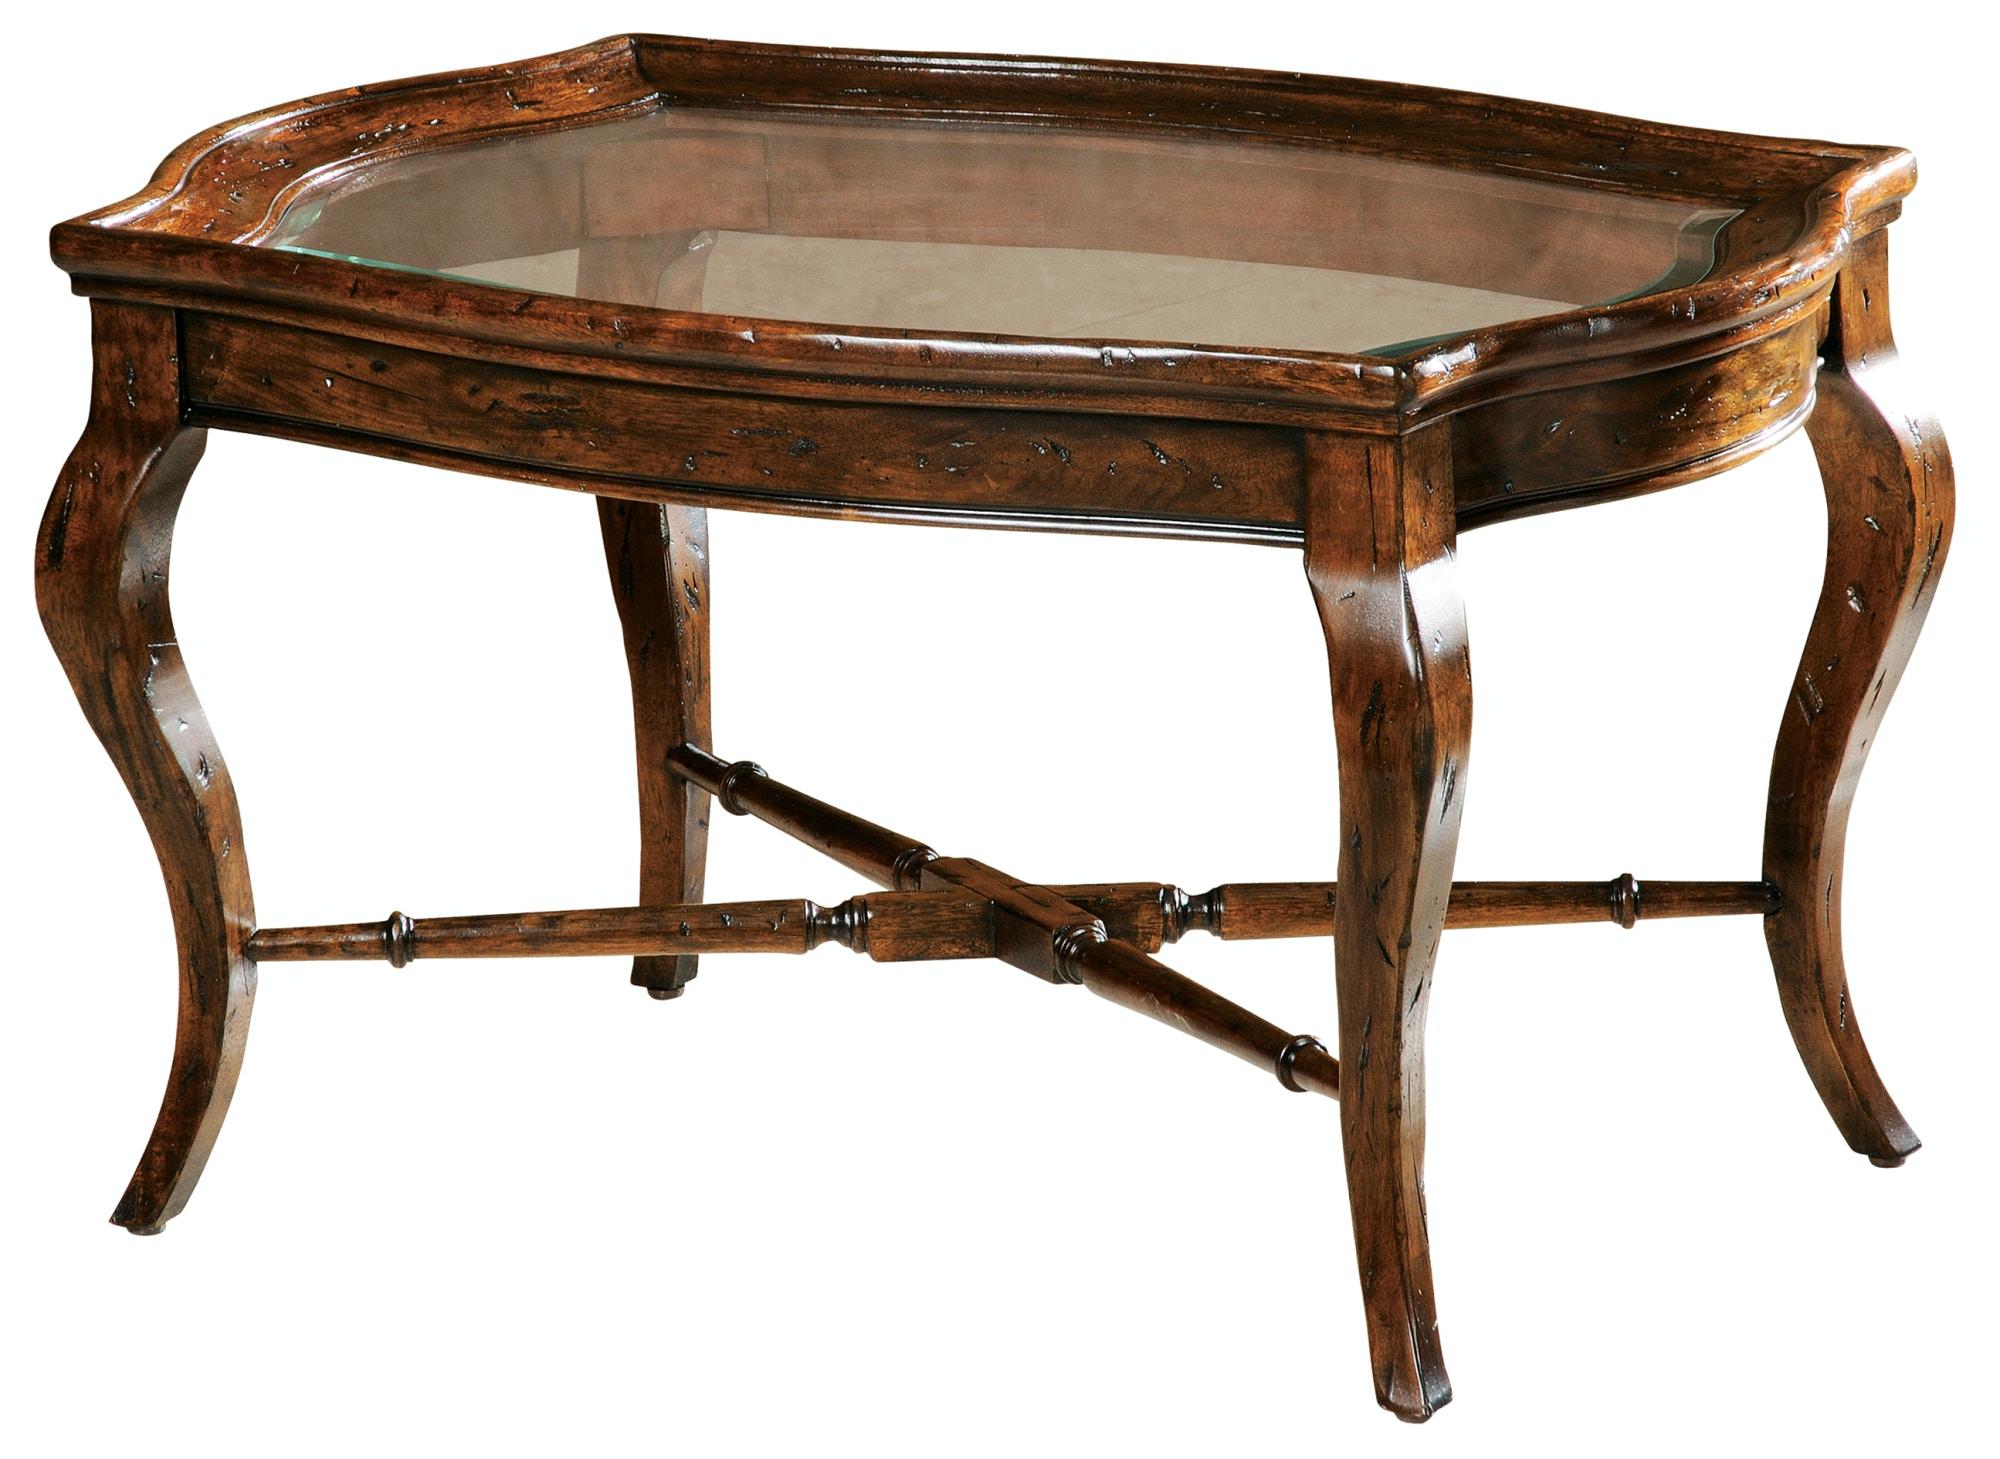 Hekman Oval Coffee Table 87200